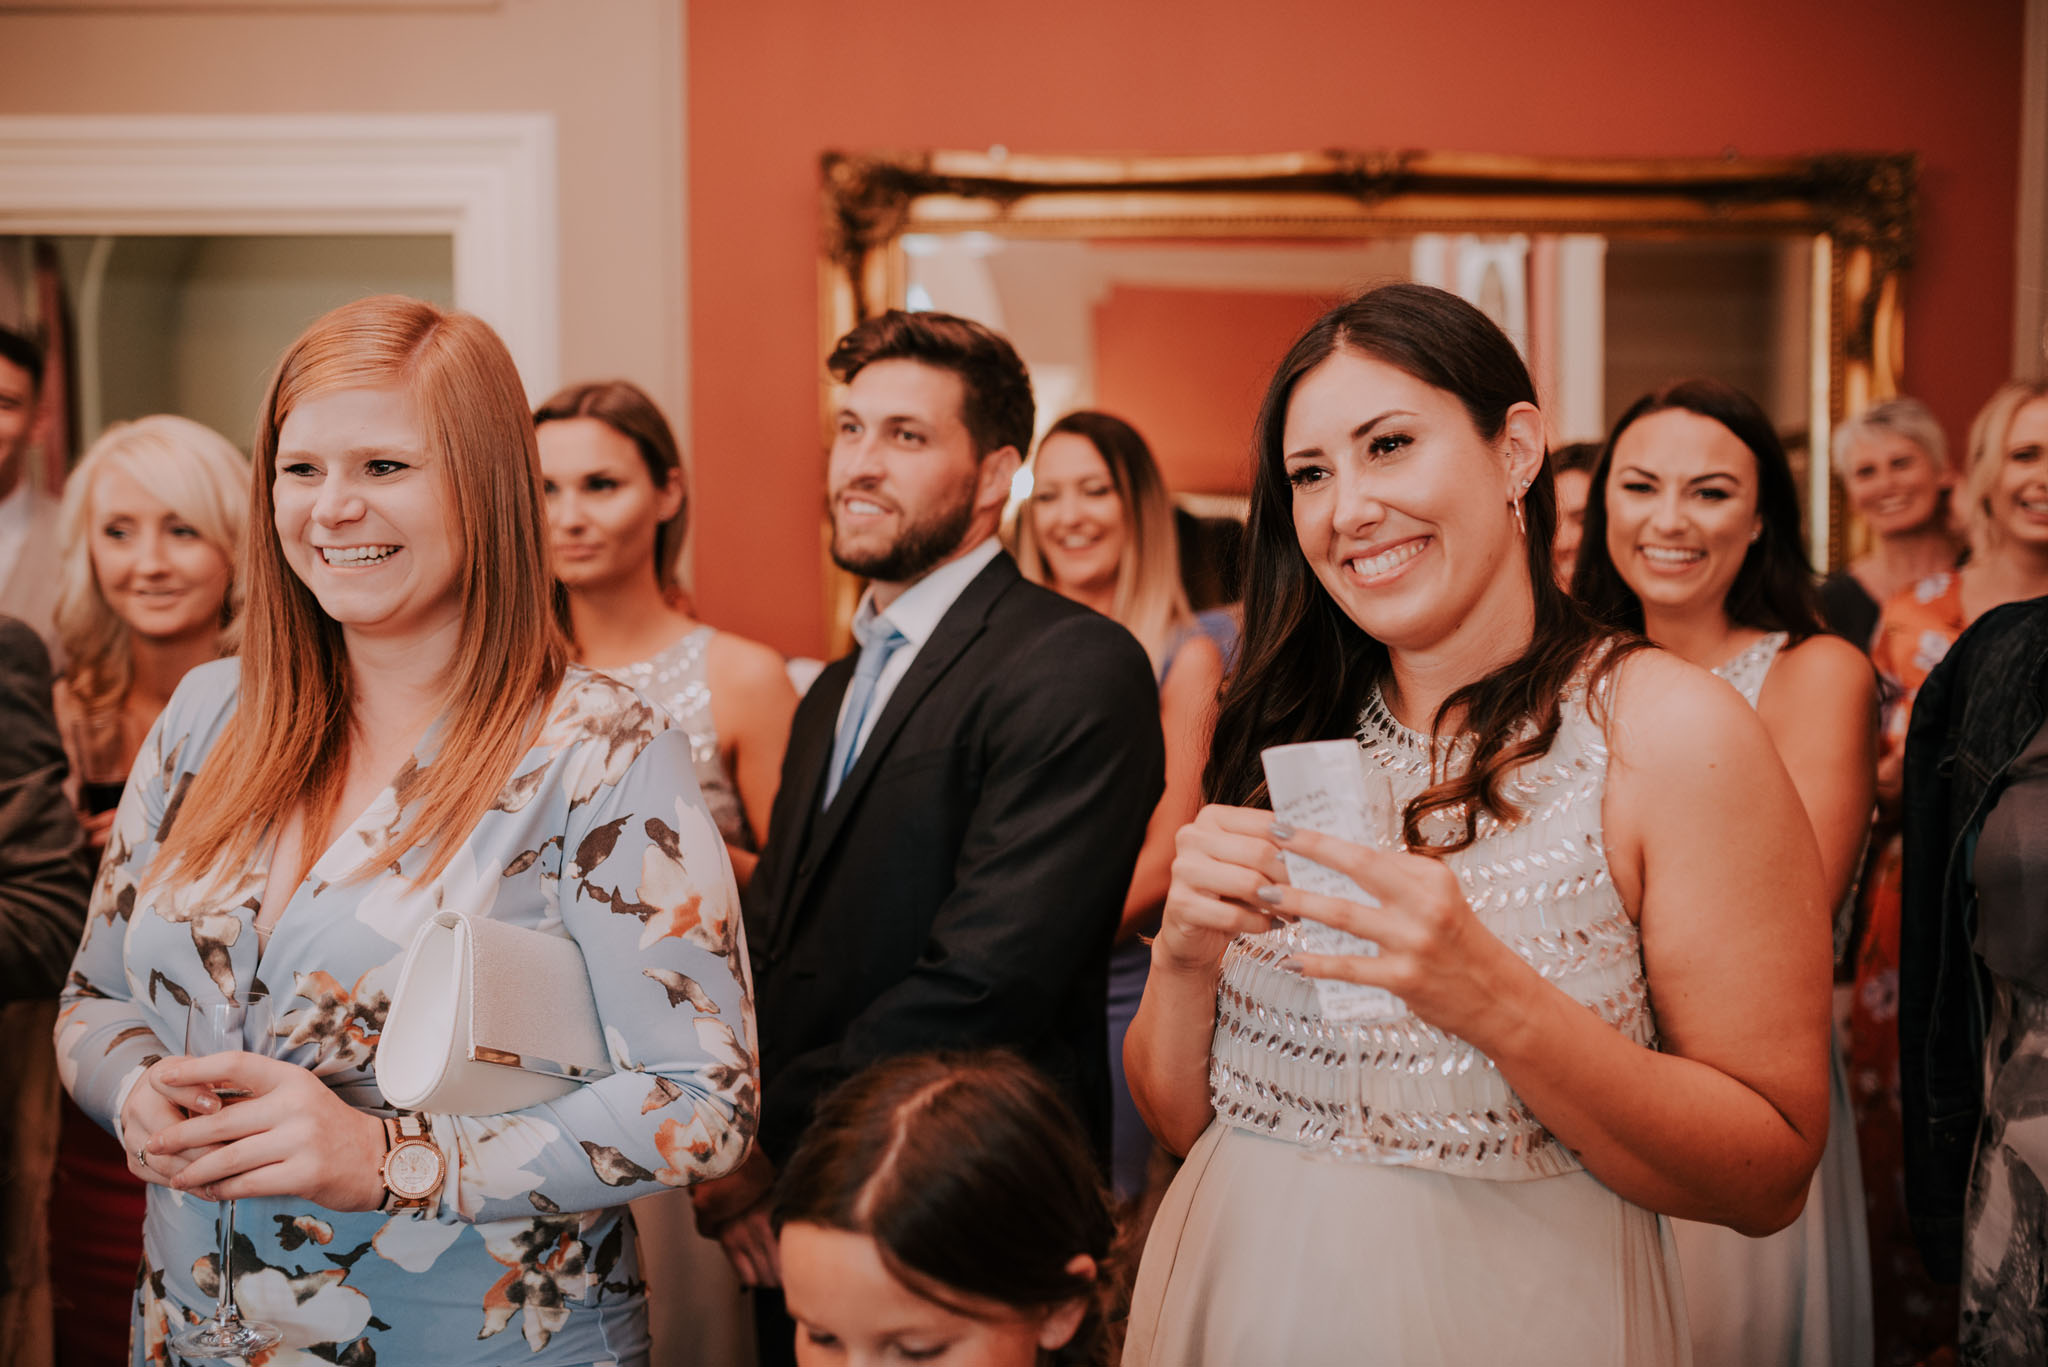 wedding-photographer-glewstone-court-hereford-scott-stockwell-photography417.jpg